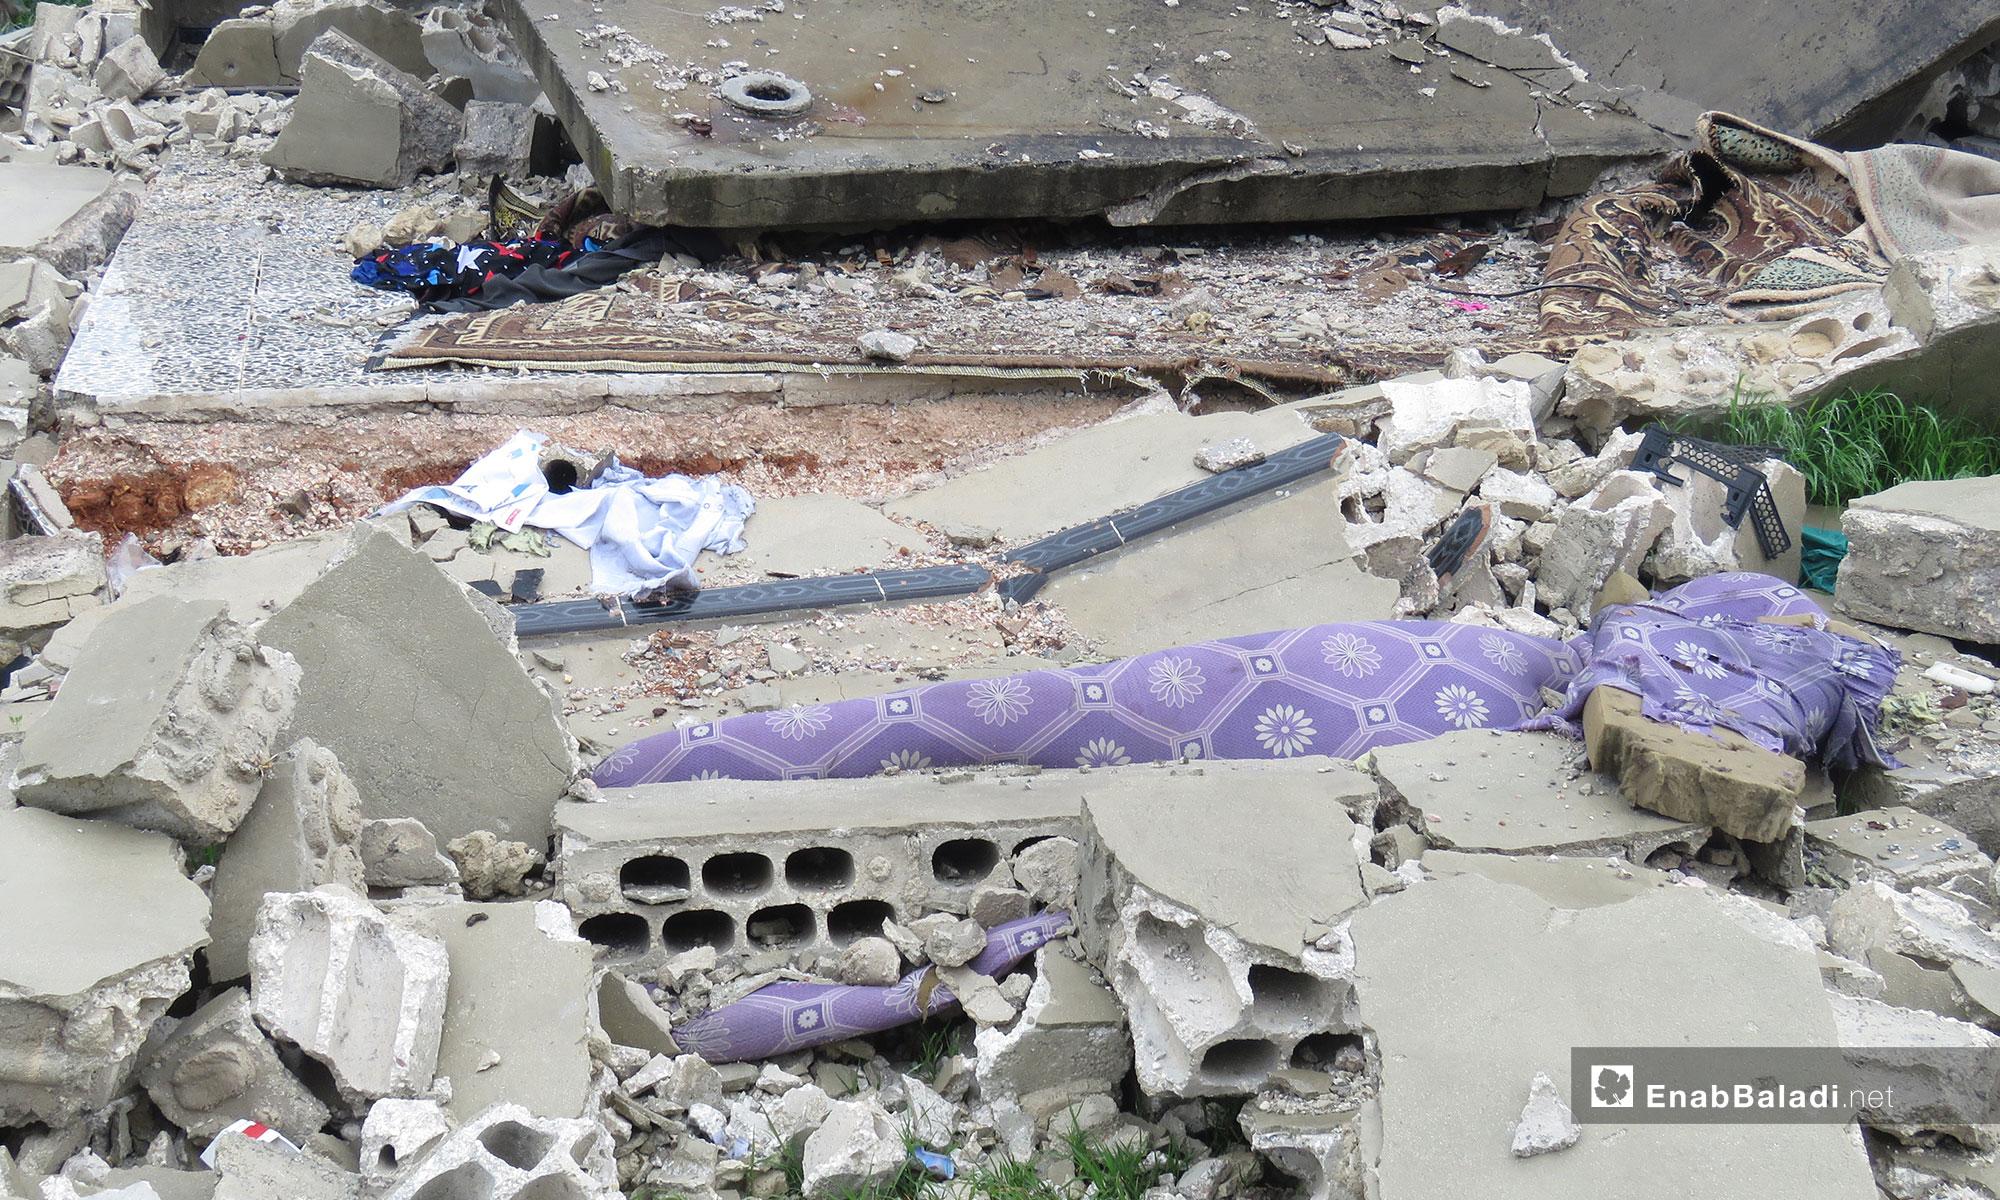 Scenes of destruction in the village of al-Sharia in al-Ghab Plain, rural Hama – March 31, 2010 (Enab Baladi)